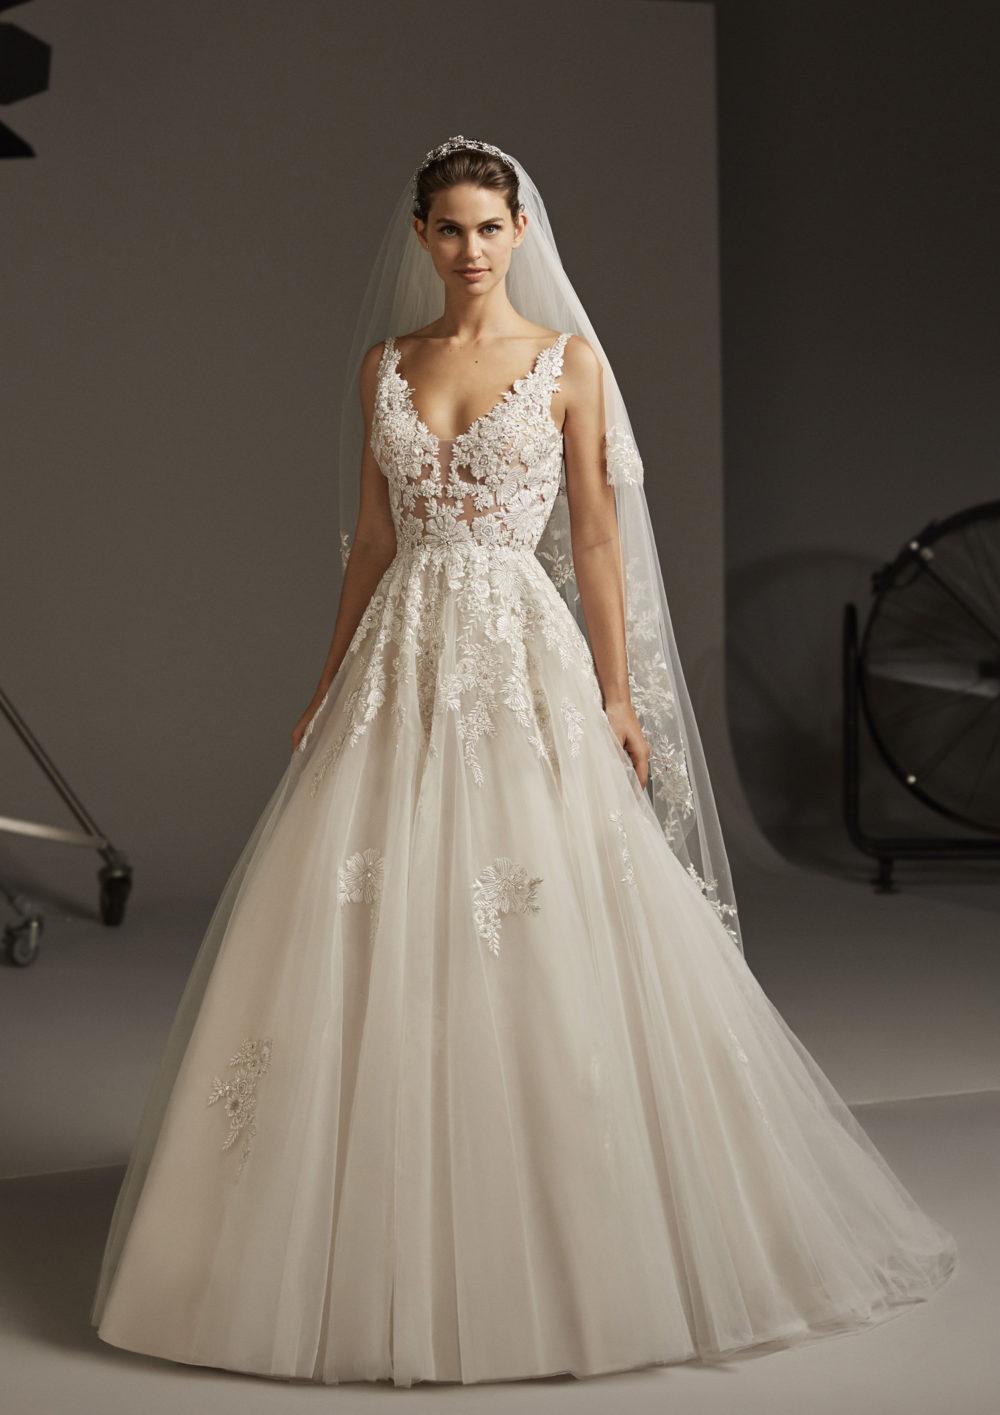 Mariages: abito da sposa Pronovias 2020 a Vicenza, Verona, Padova, Veneto ARIEL